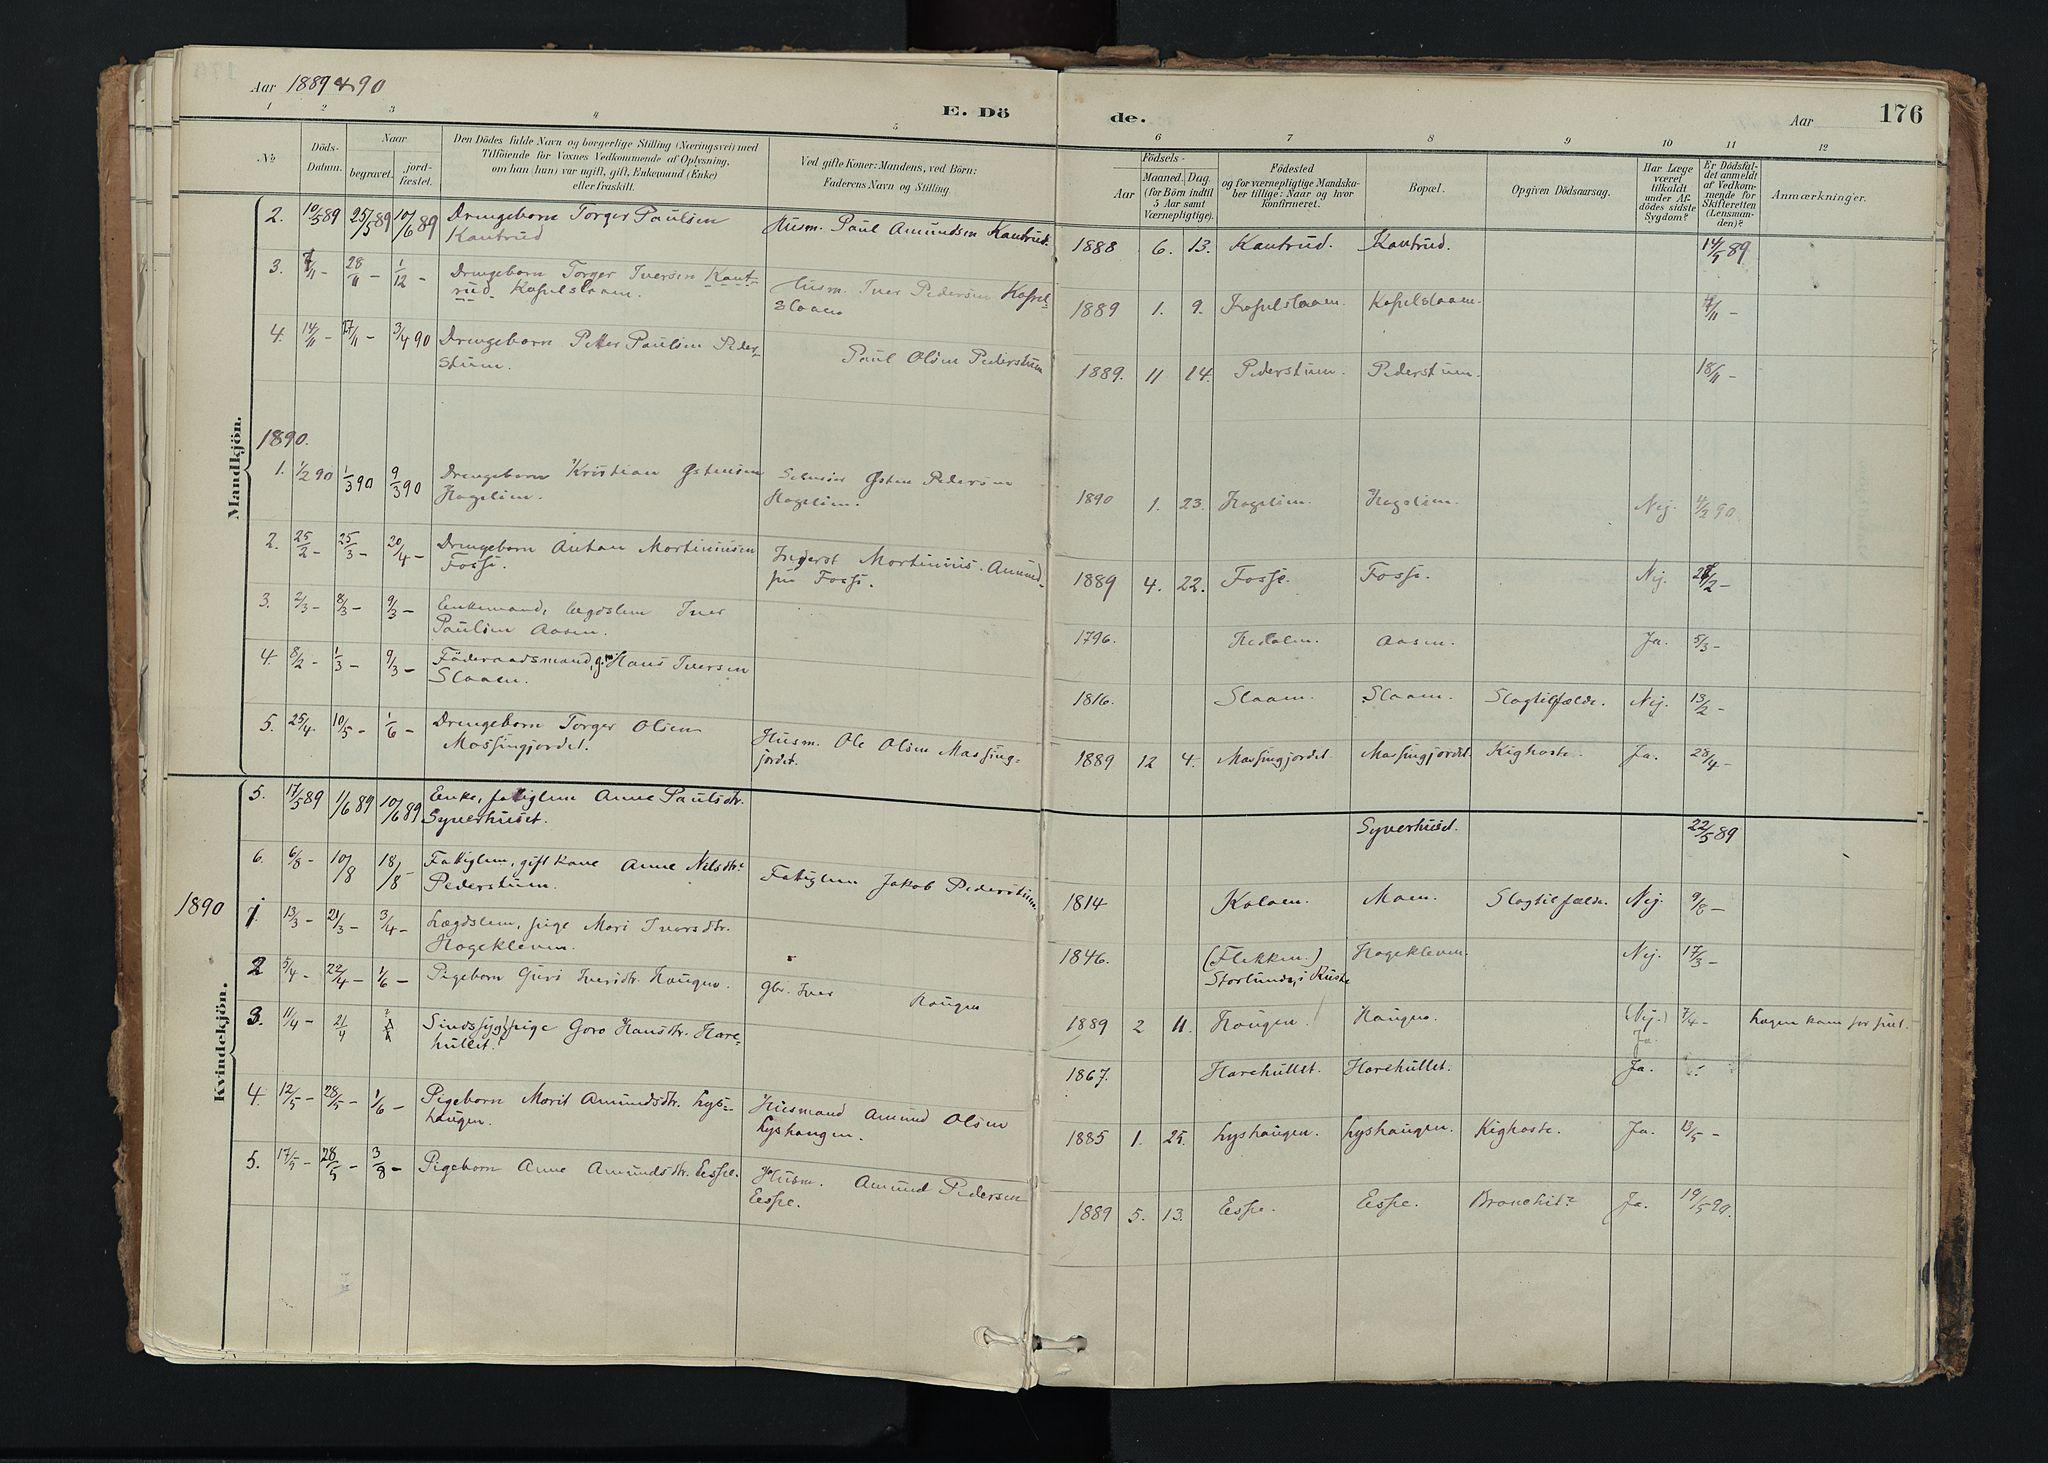 SAH, Nord-Fron prestekontor, Ministerialbok nr. 5, 1884-1914, s. 176